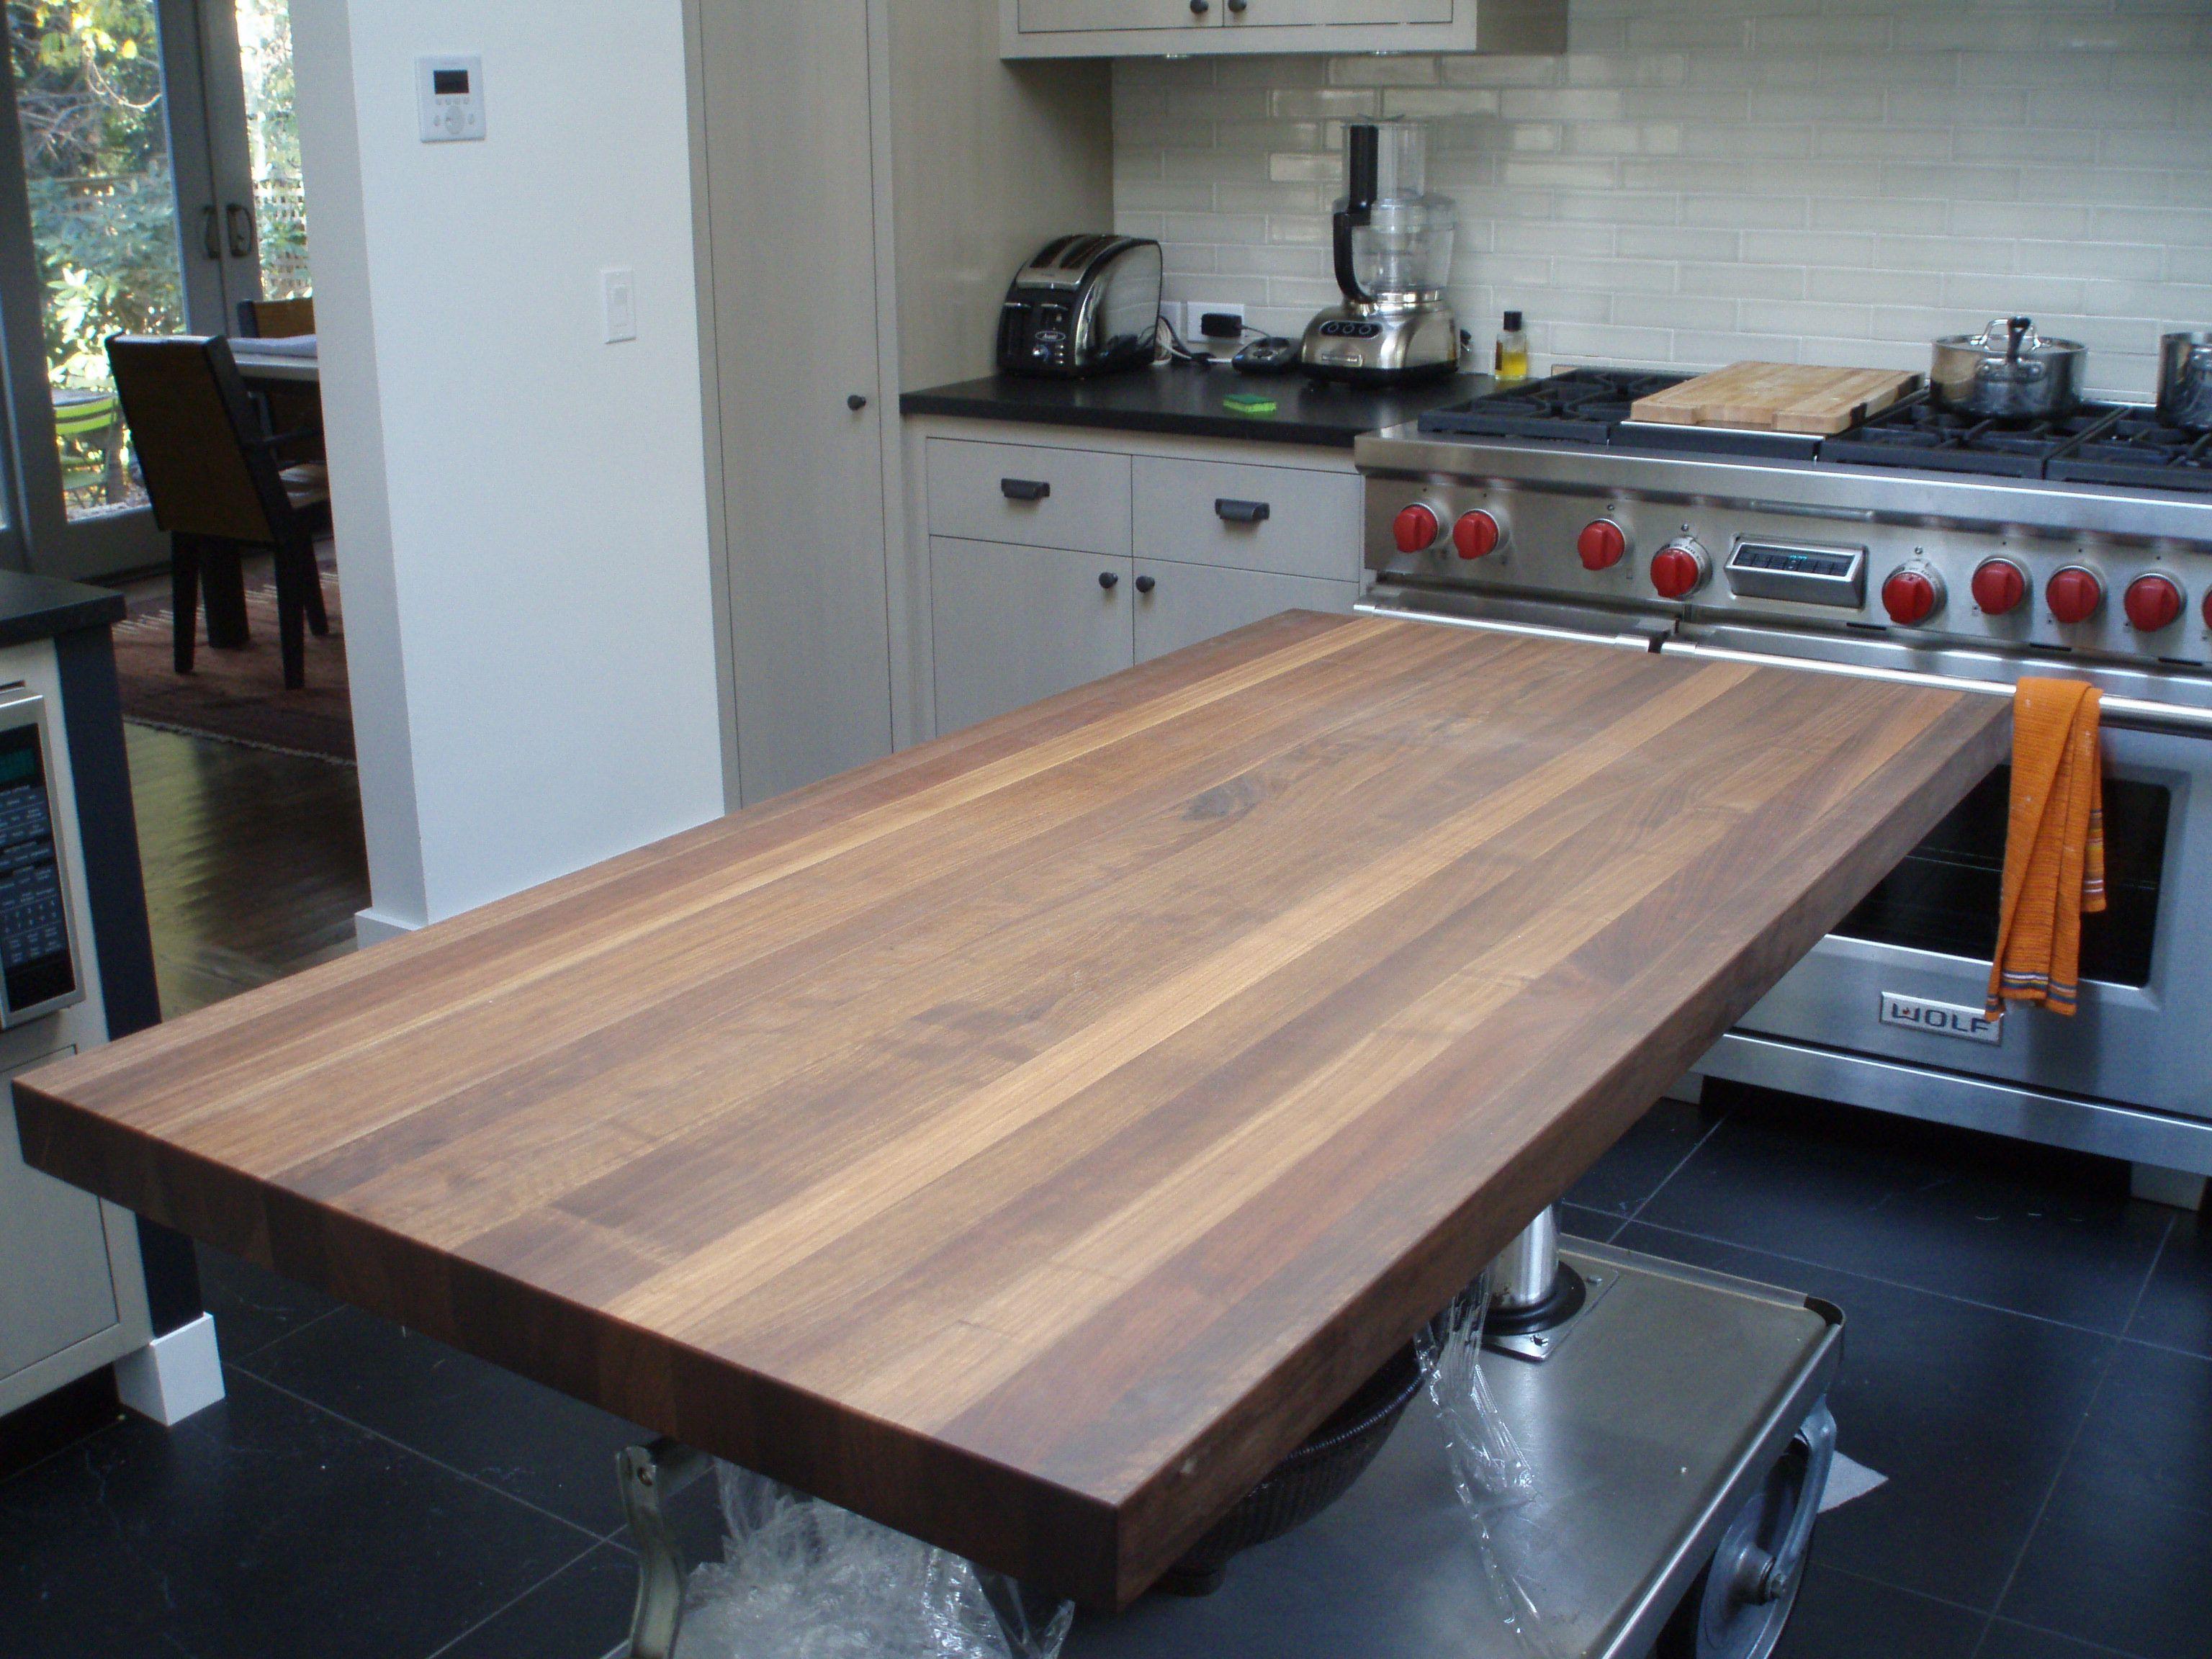 Standard Plank Walnut Island Countertop In A Transitional Kitchen